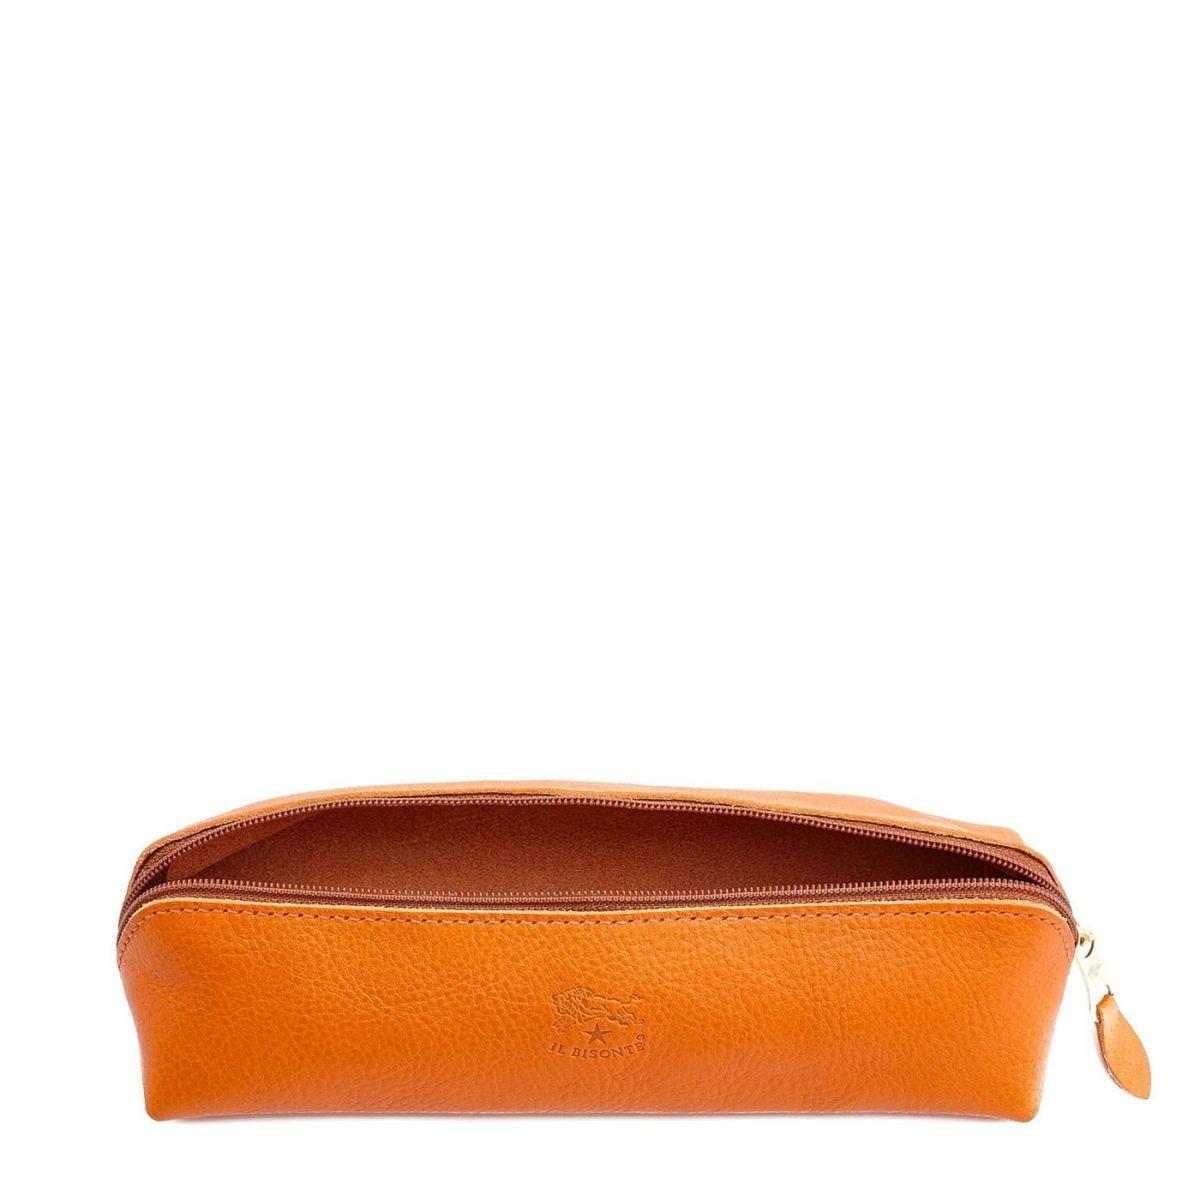 Women's Case  in Cowhide Double Leather SCA020 color Orange | Details